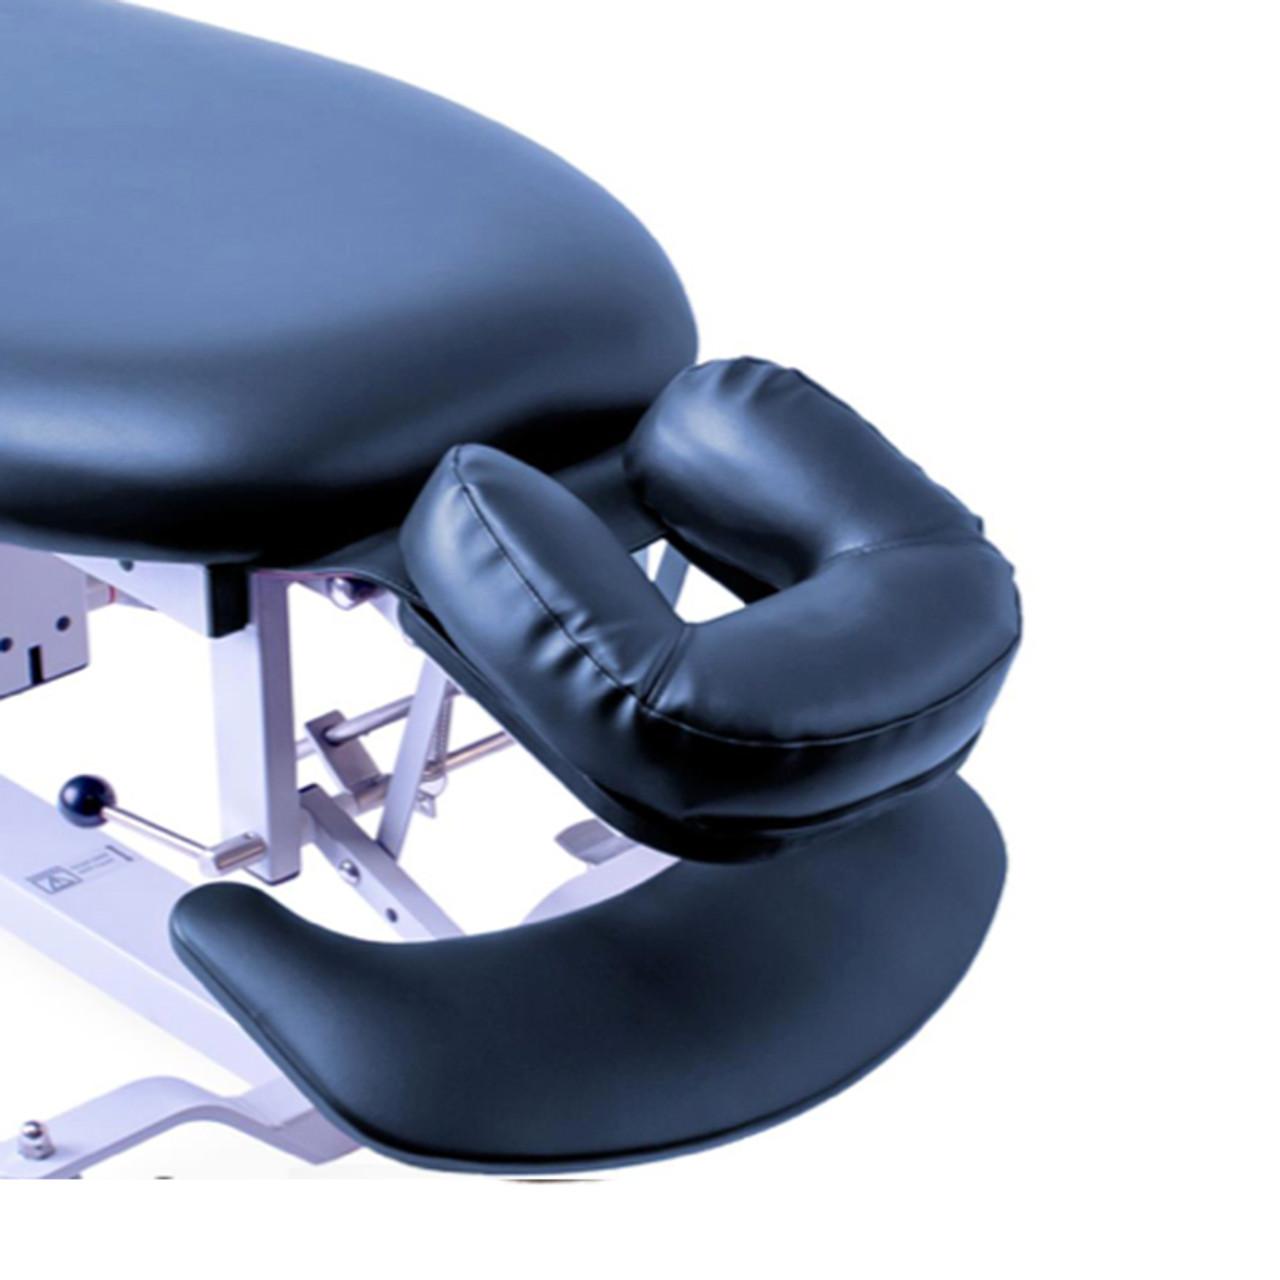 Headrest and Removable Armrest